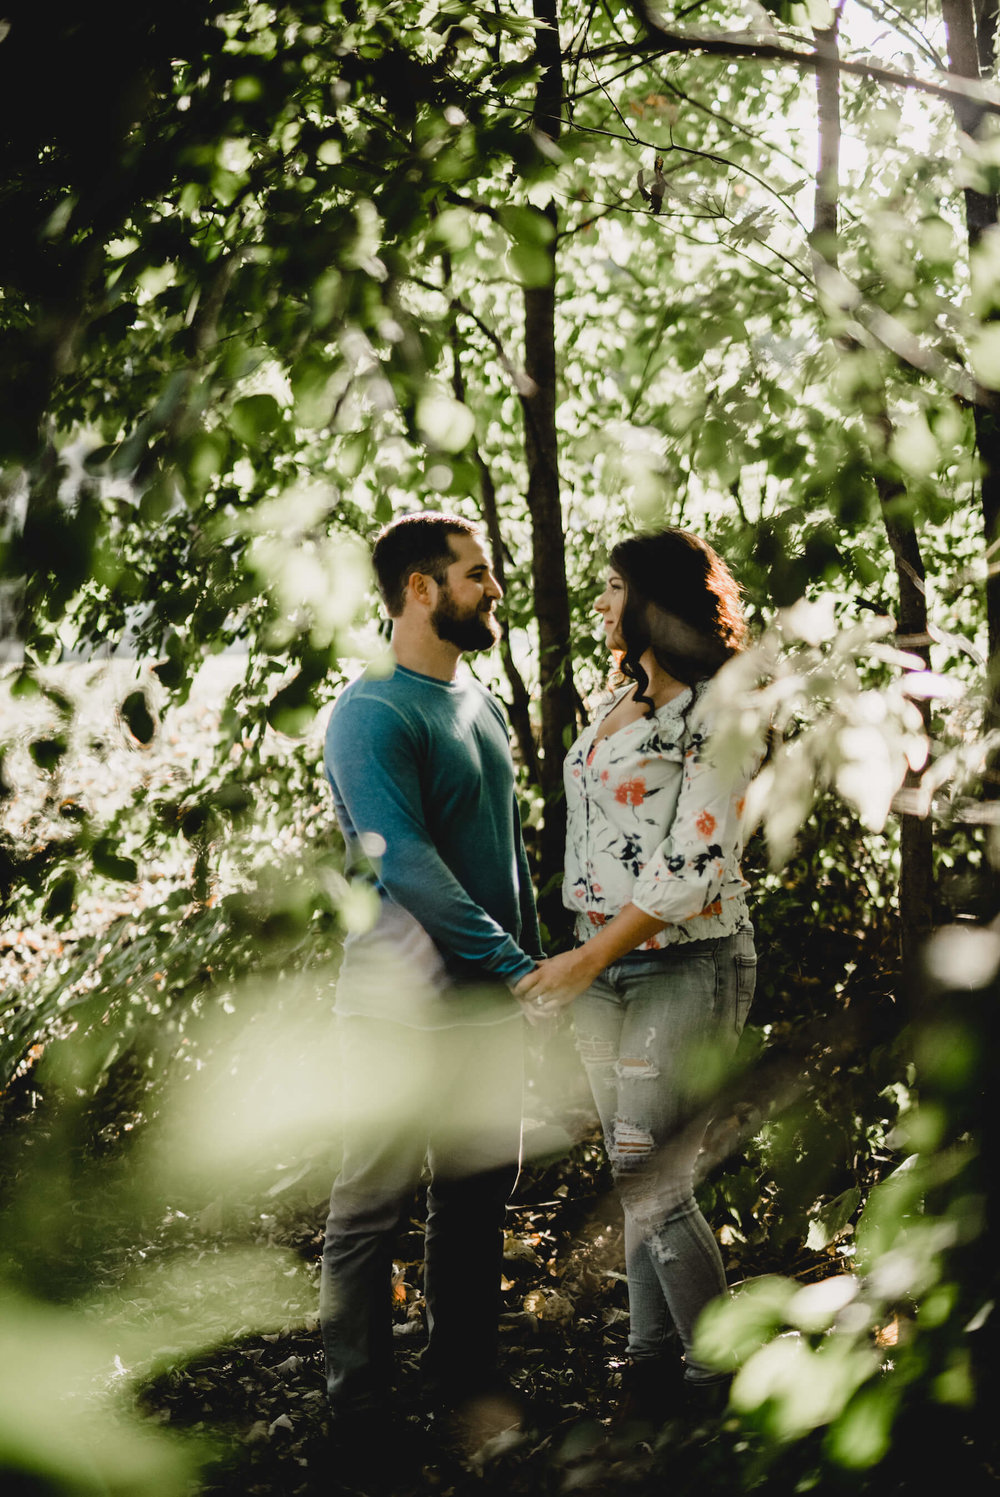 Engle-Olson-Chad-Jen-Engagement-19.jpg